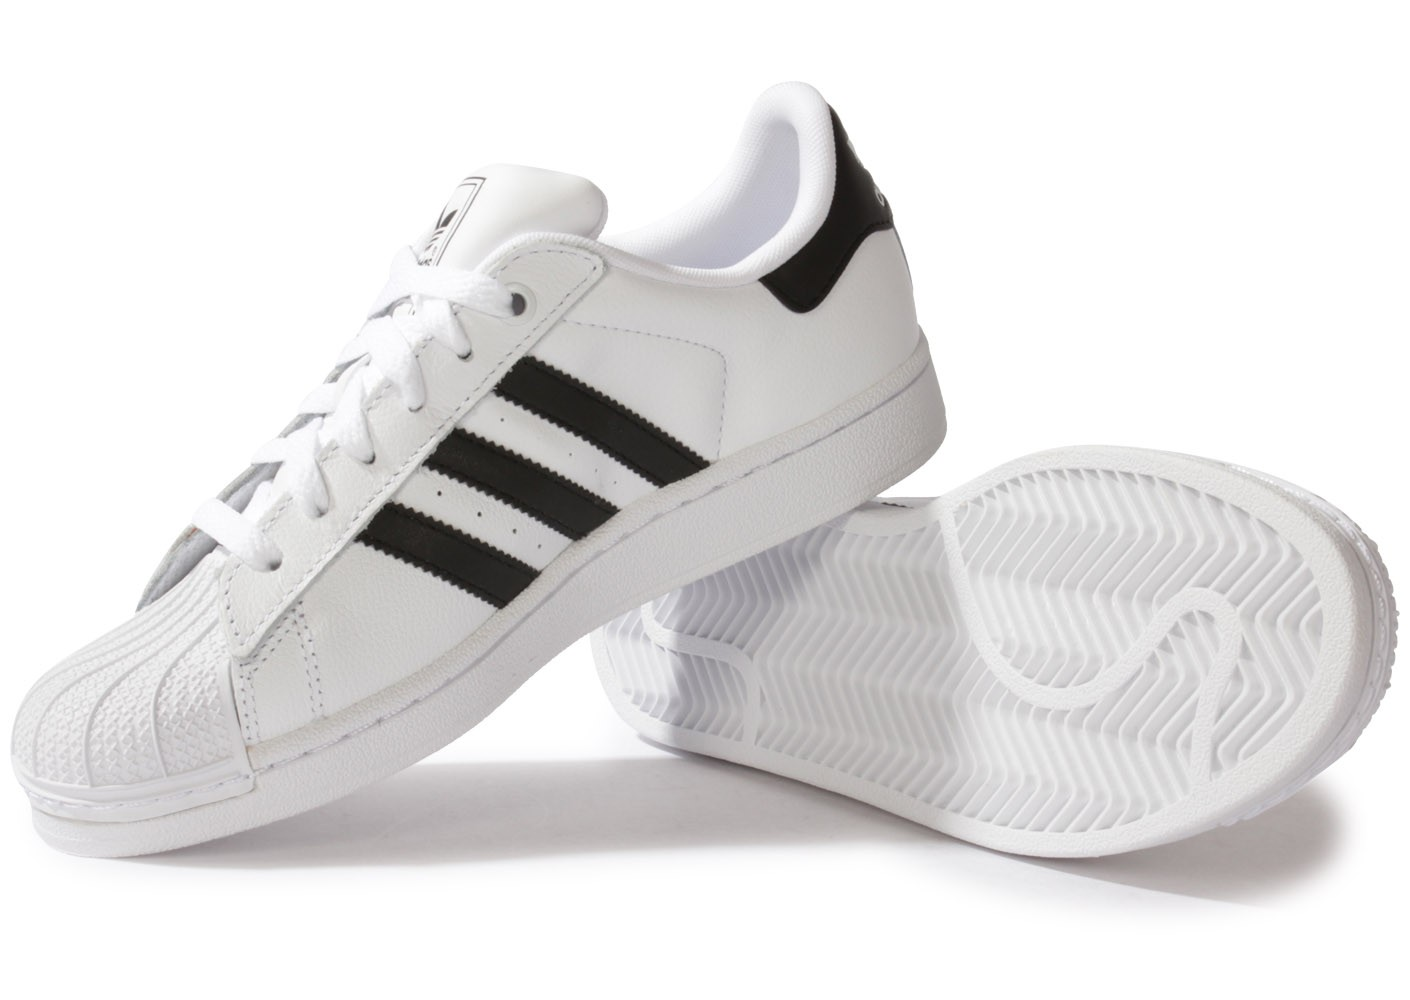 adidas chaussures femme pas cher allow project.eu